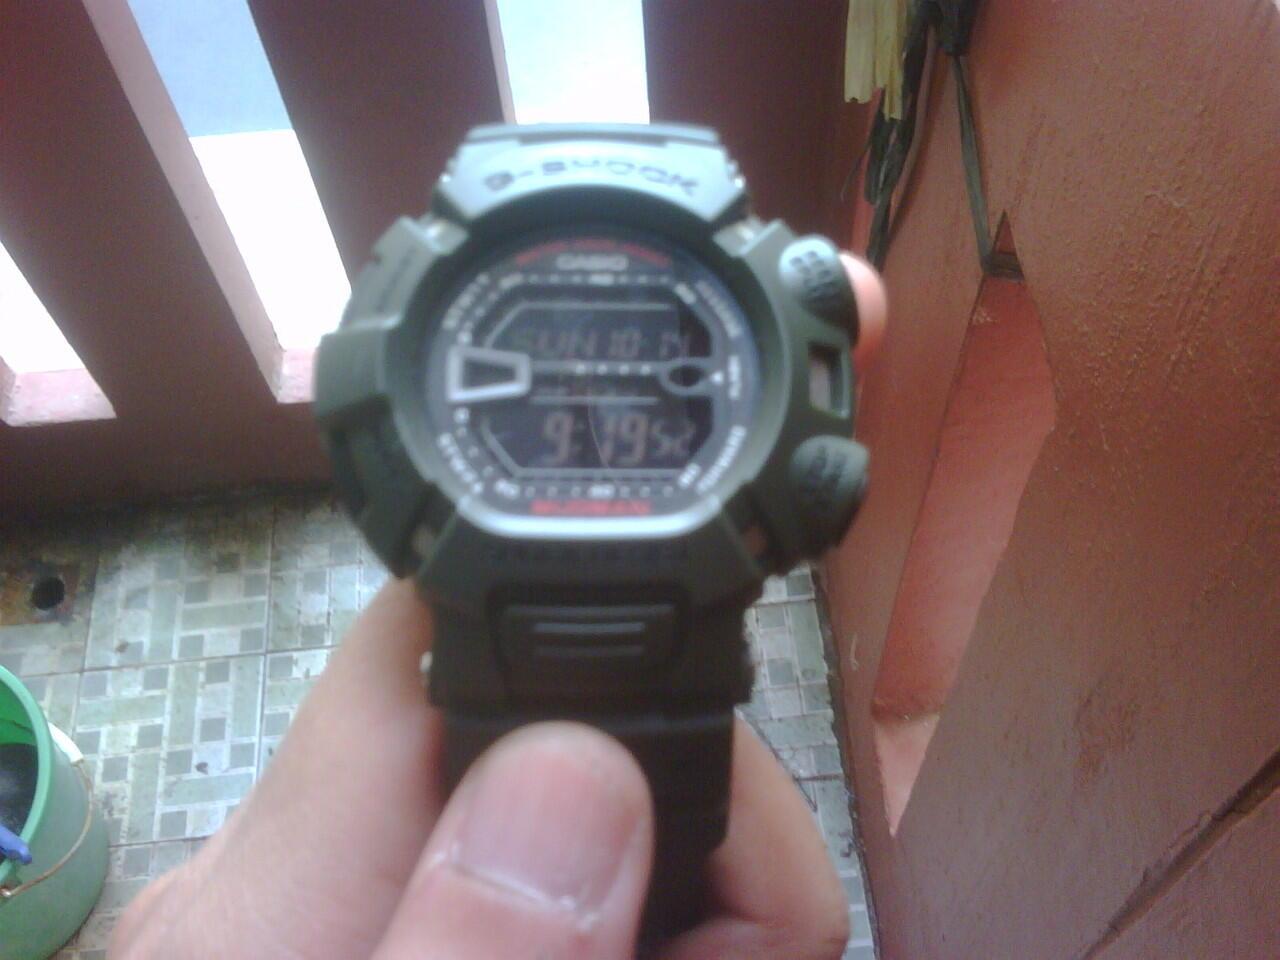 WTS GSHOCK G9000 MudMan Series